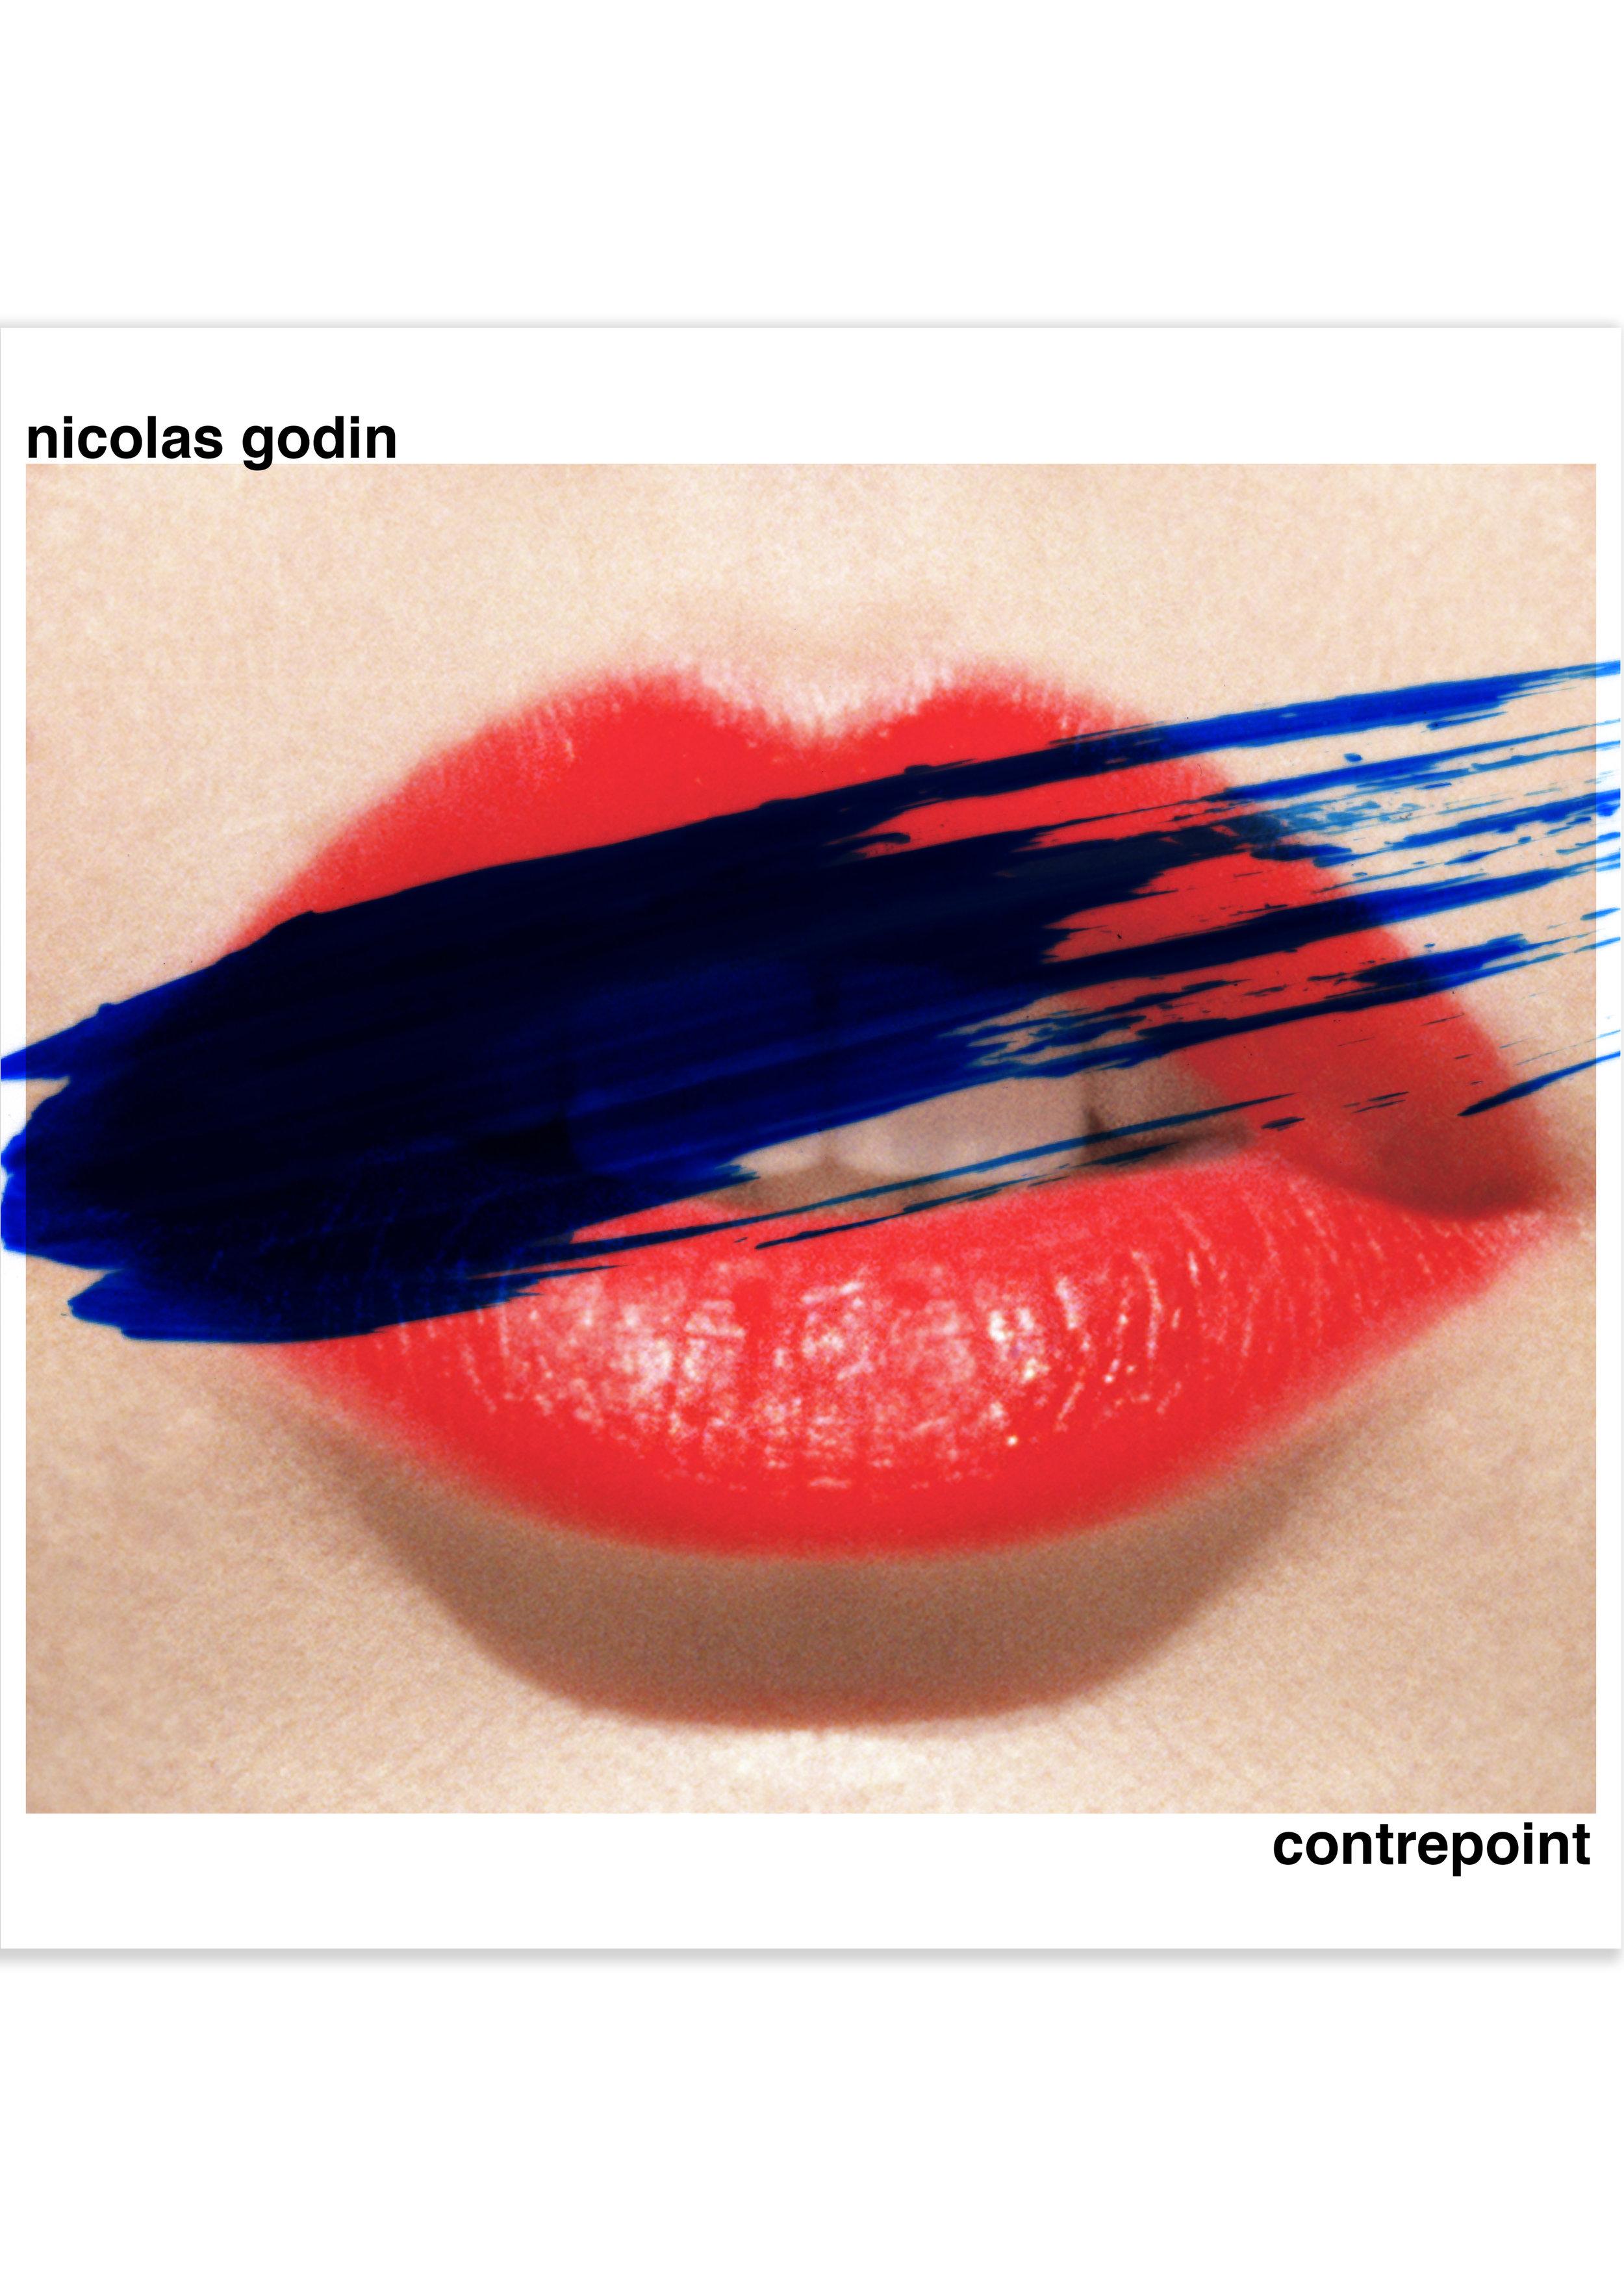 Nicolas Godin - Contrepoint 2016